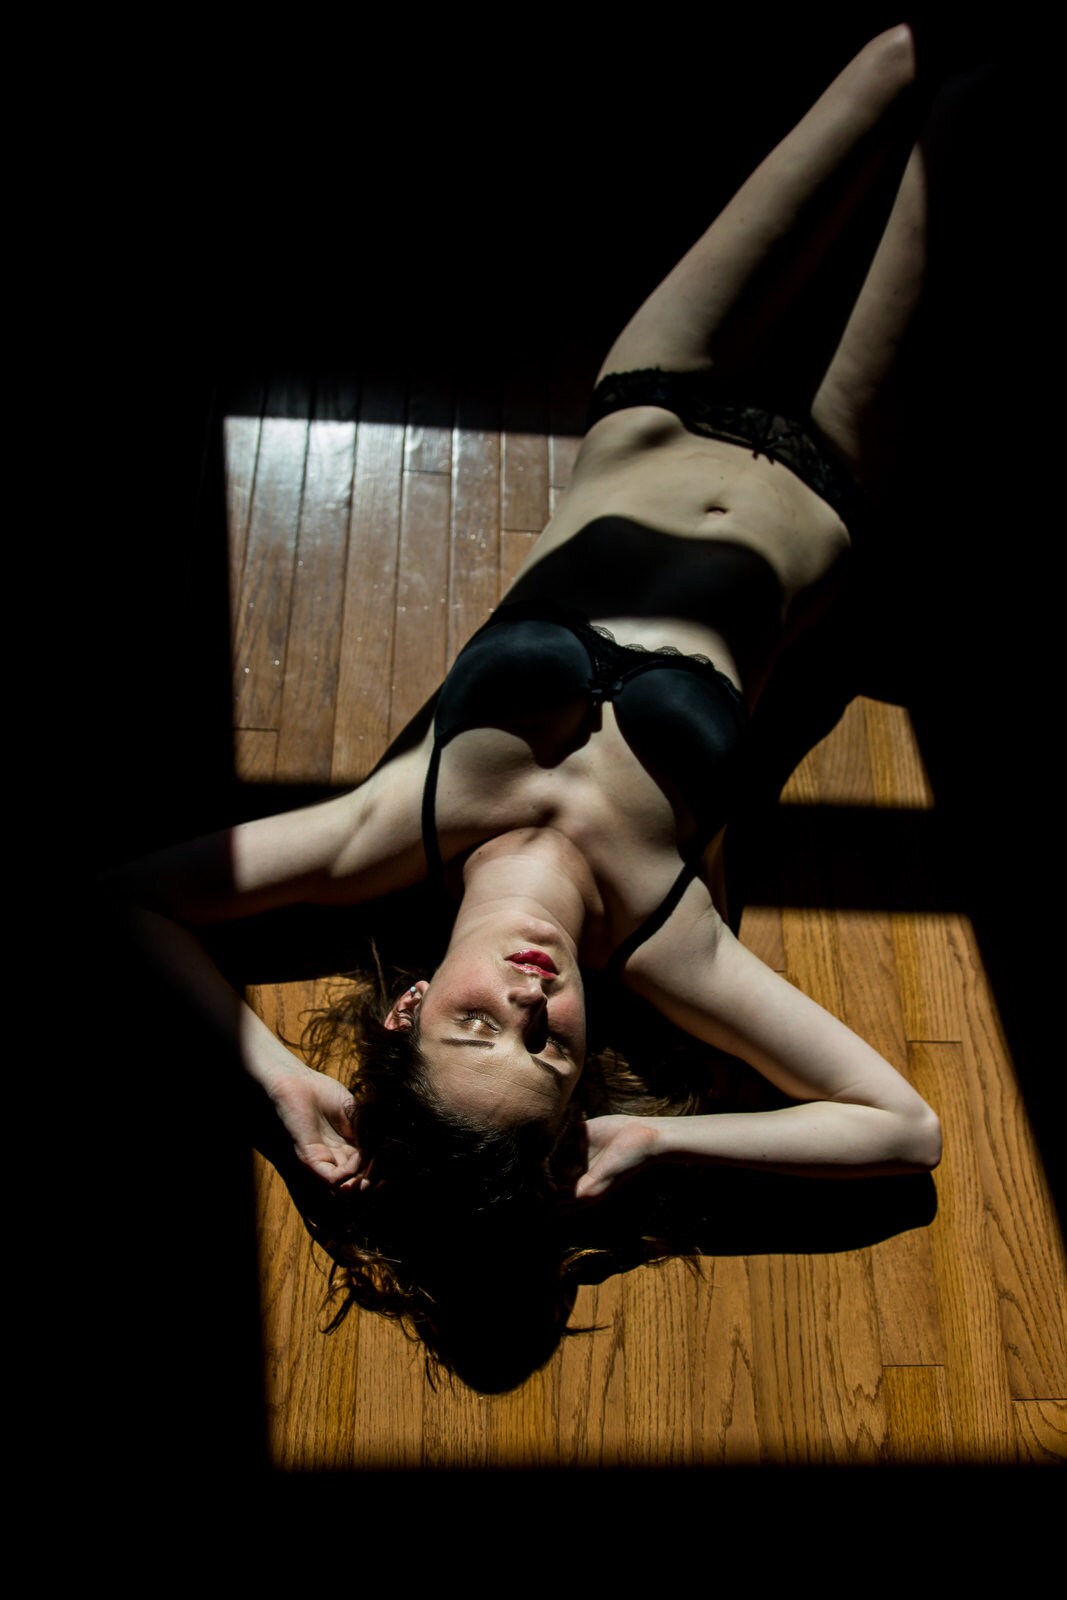 In-home-boudoir-photographer-6872.JPG